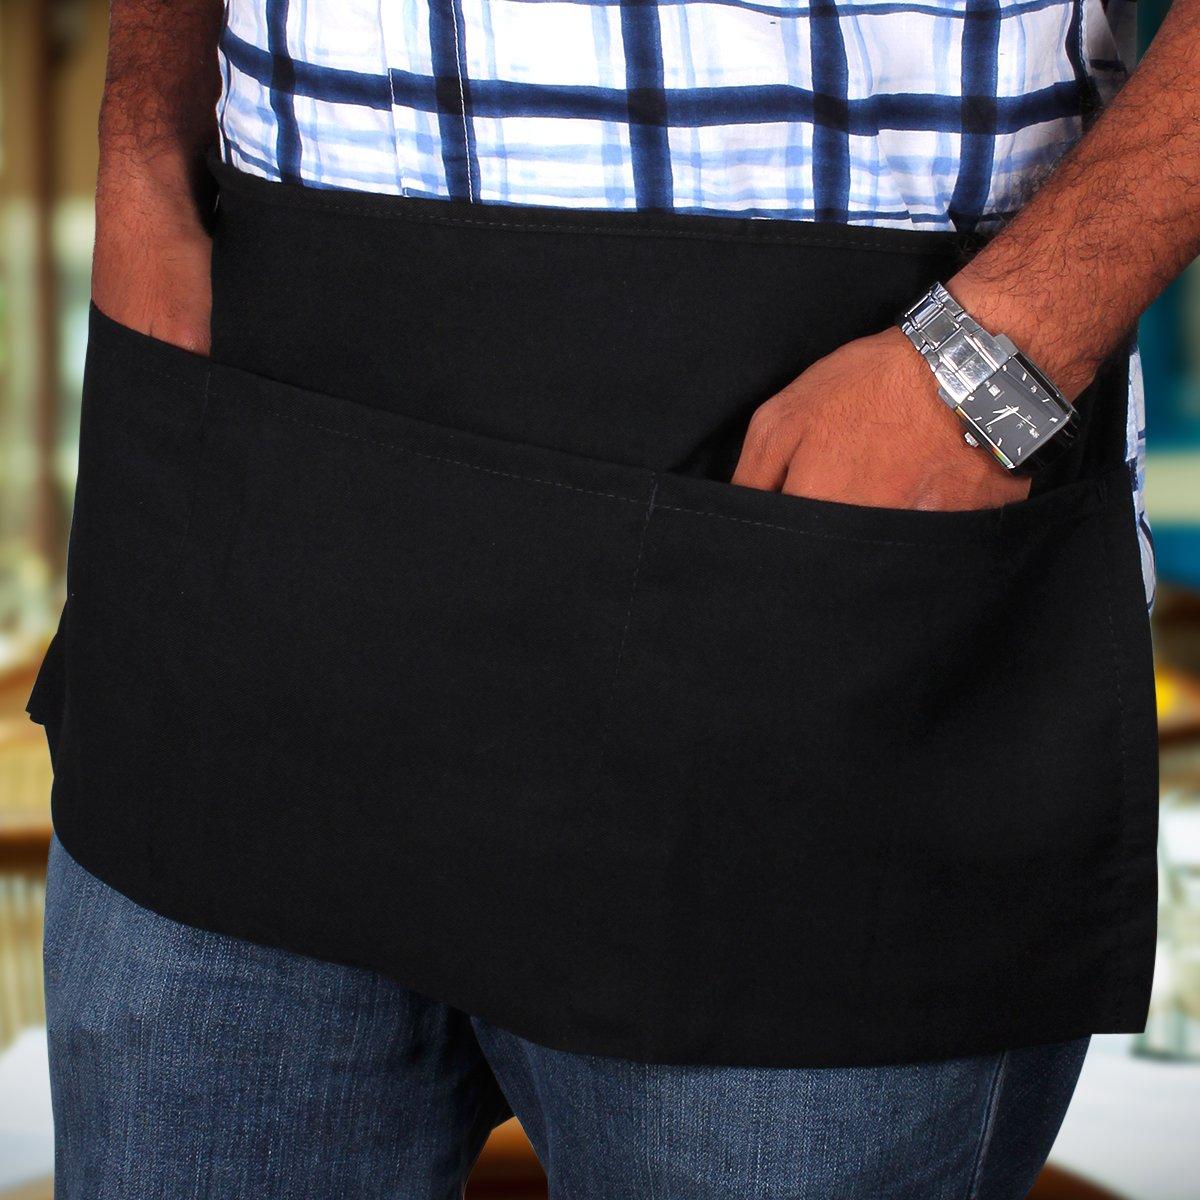 Utopia Kitchen 3 Pockets Waist Apron (Set of 12, Black, 24 x 12 inches) - Restaurant Half Aprons, Bartender Apron, Money Apron, Check Holder by Utopia Kitchen (Image #4)